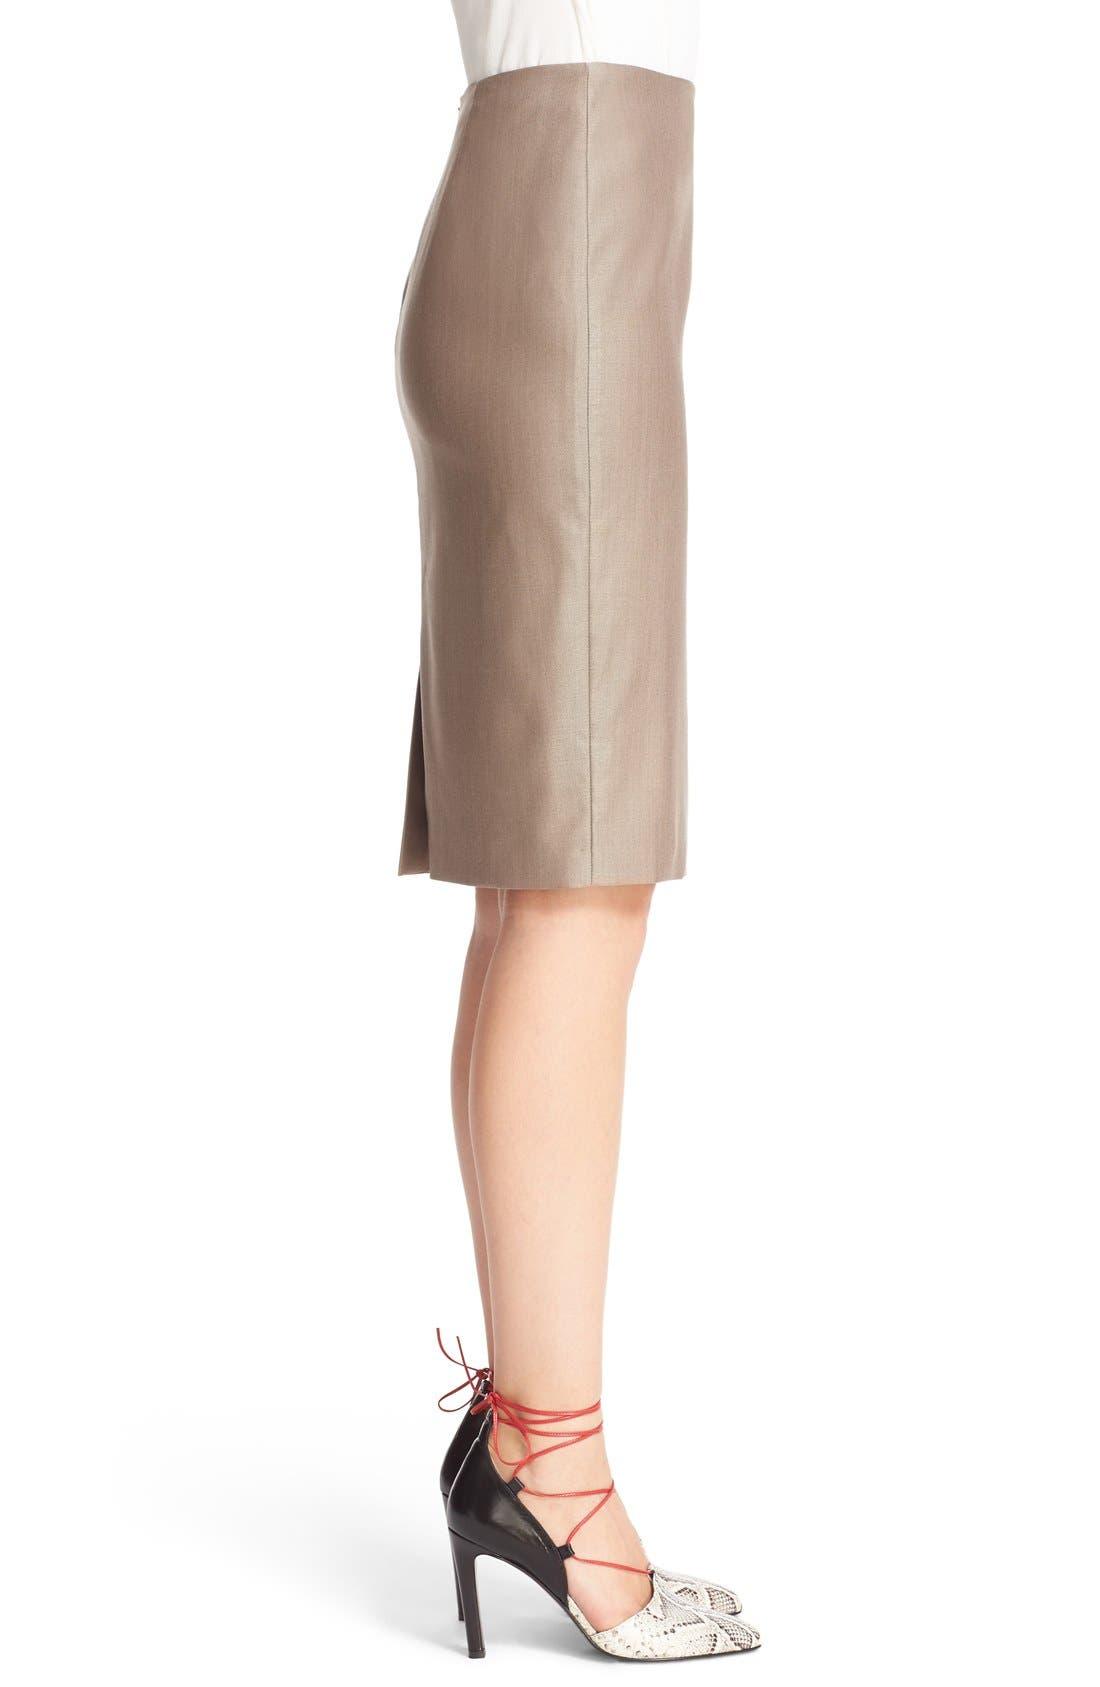 Wool Blend Pencil Skirt,                             Alternate thumbnail 9, color,                             220